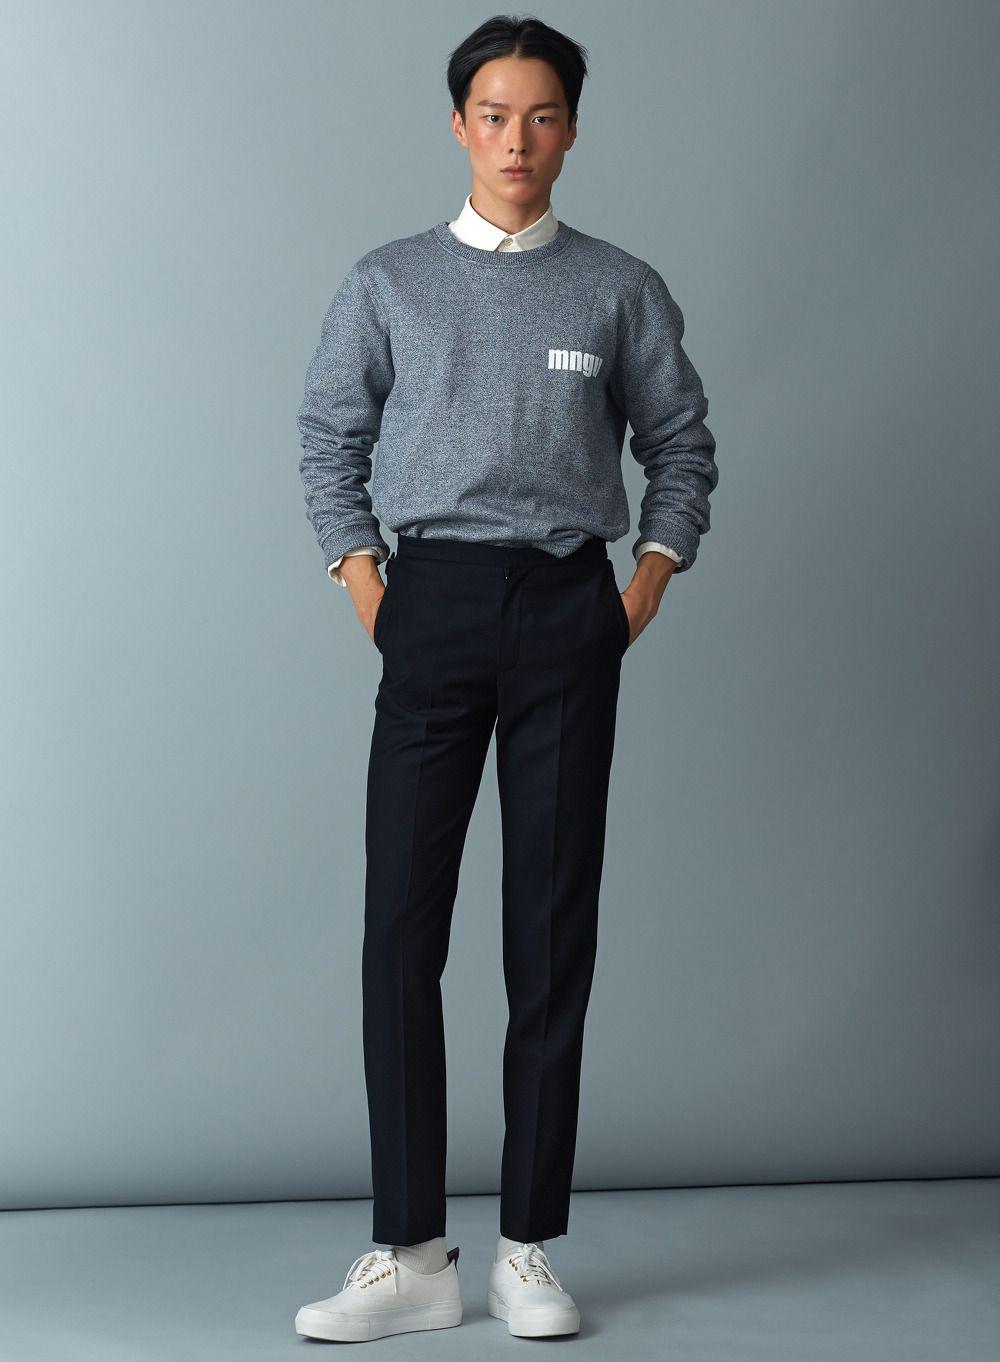 jang-ki-Yong | Tumblr | jang ki yong | Tumblr, Korean